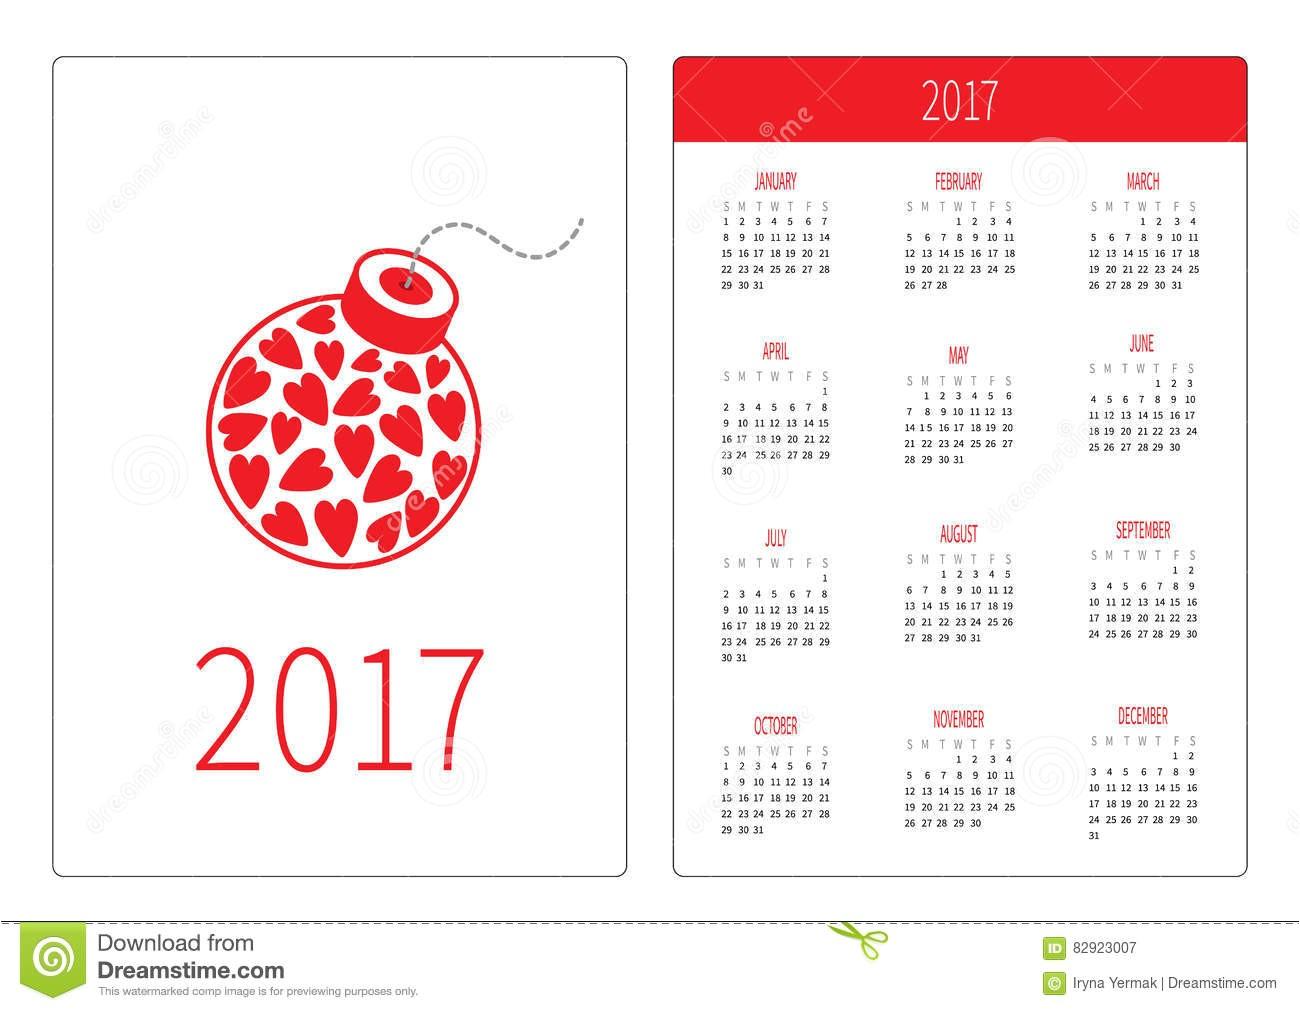 Pocket Calendar Template 2017 Pocket Calendar 2017 Year Week Starts Sunday Flat Design